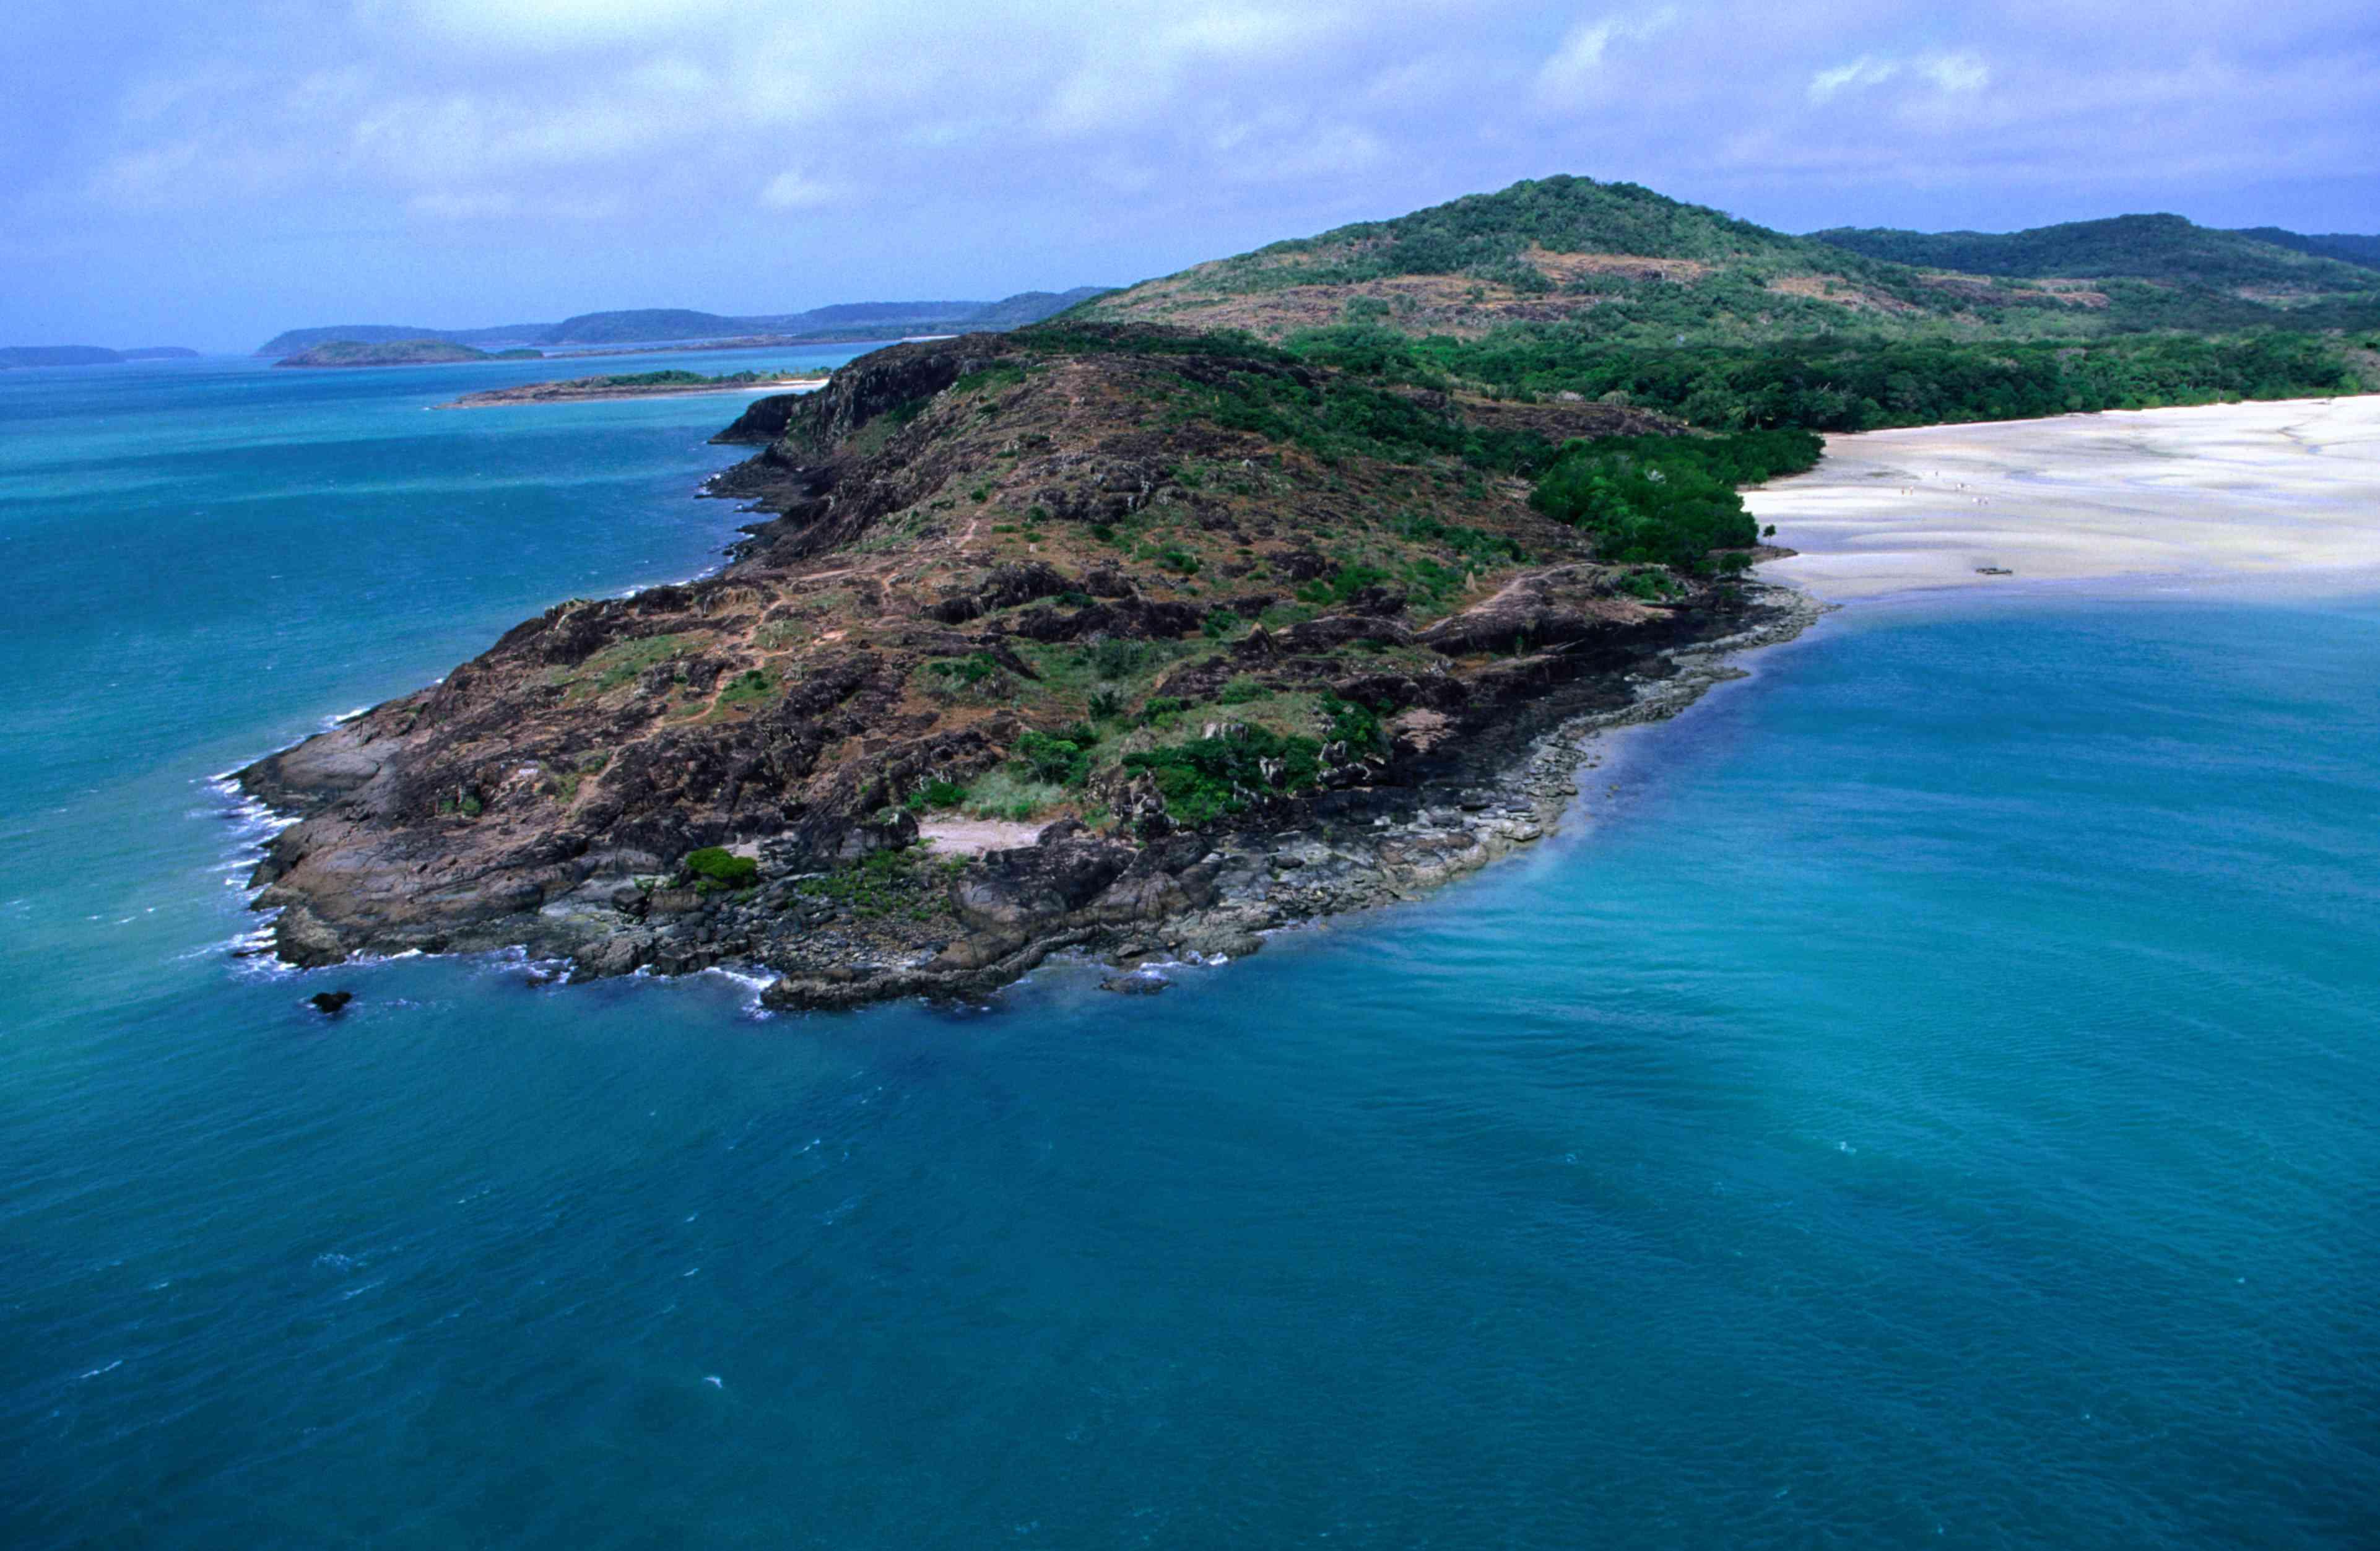 Tip of Cape York Peninsula in Australia